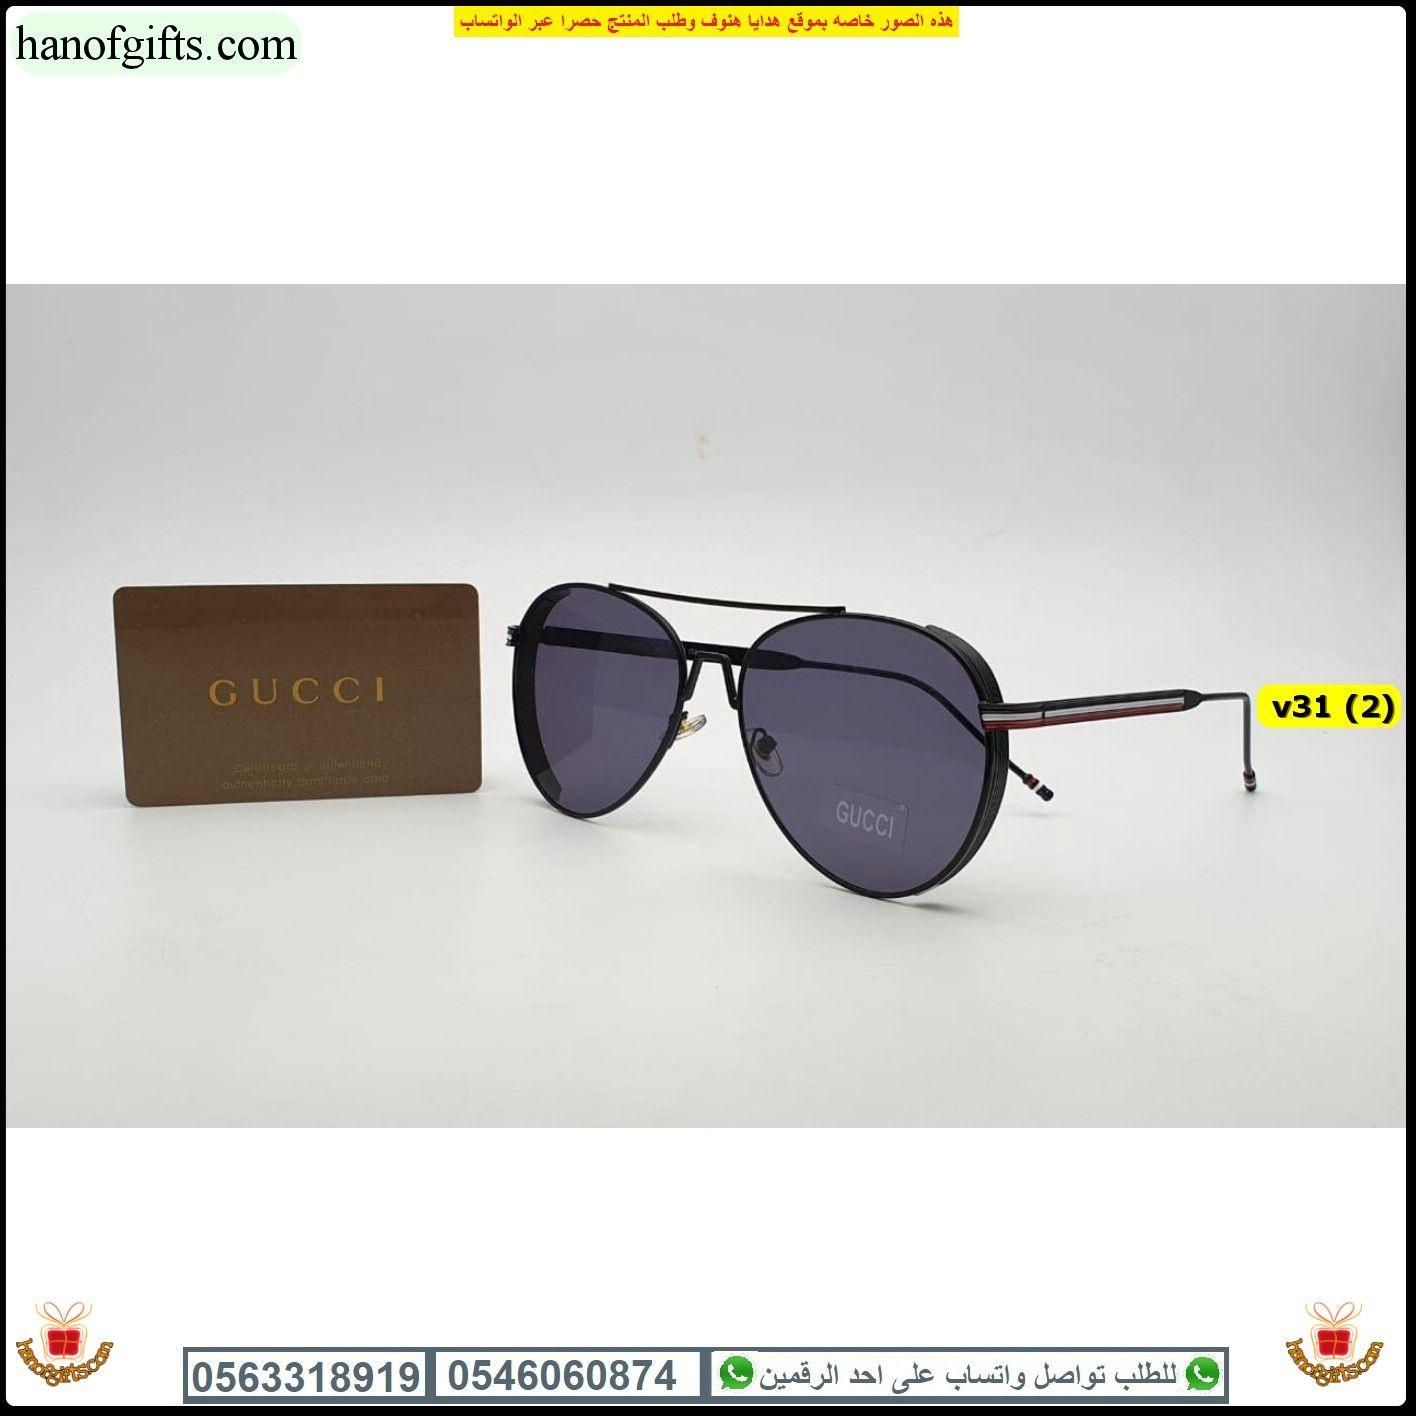 Gucci نظارات قوتشي رجالي مع أفخم ملحقات الماركة من كيس و علبة الماركة هدايا هنوف Glasses Sunglasses Fashion